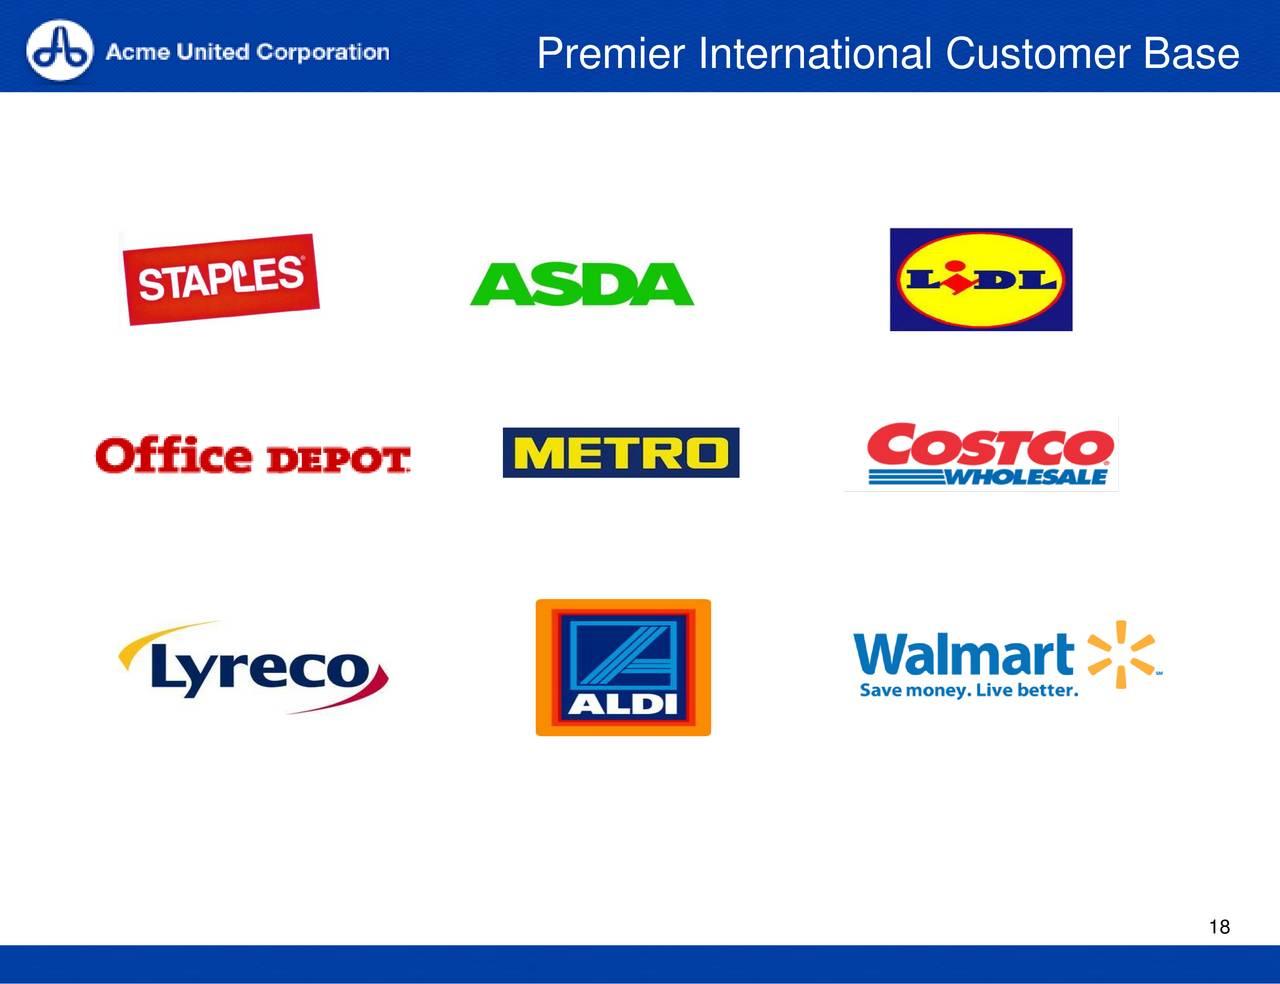 acme united corporation Officedepotcom.